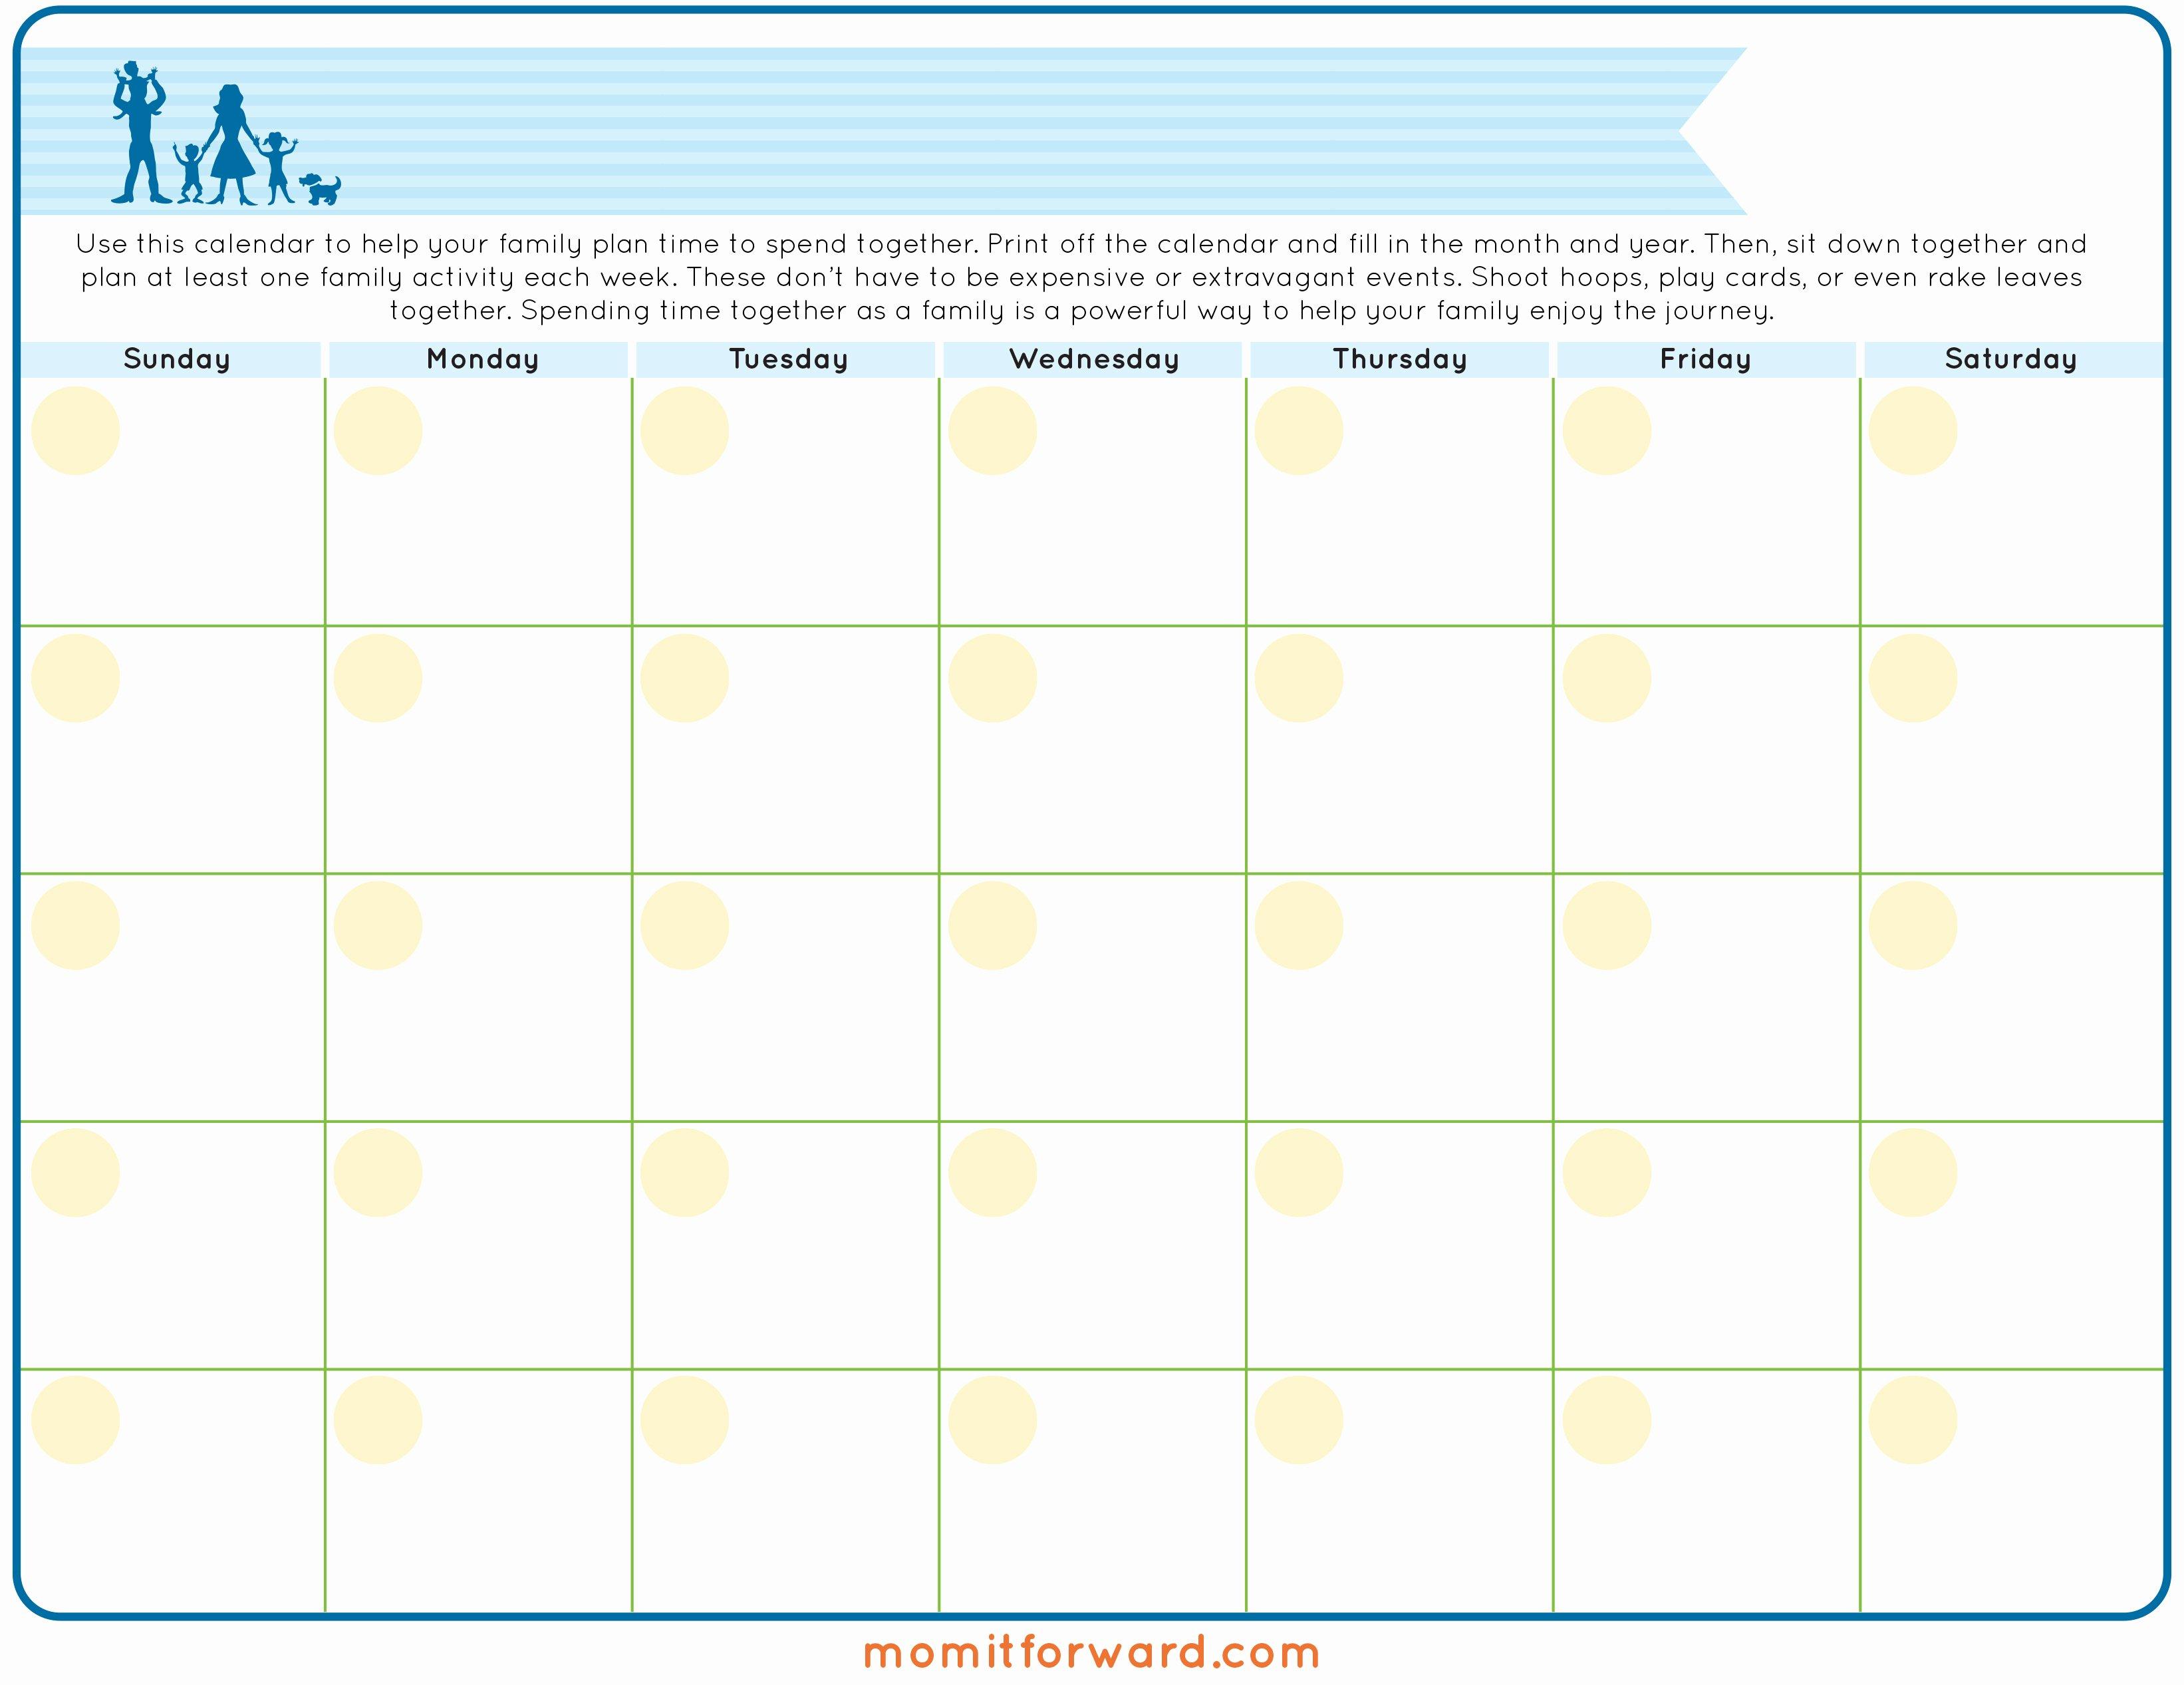 Free Printable Family Calendar Awesome Family Calendar Printable Mom It forwardmom It forward